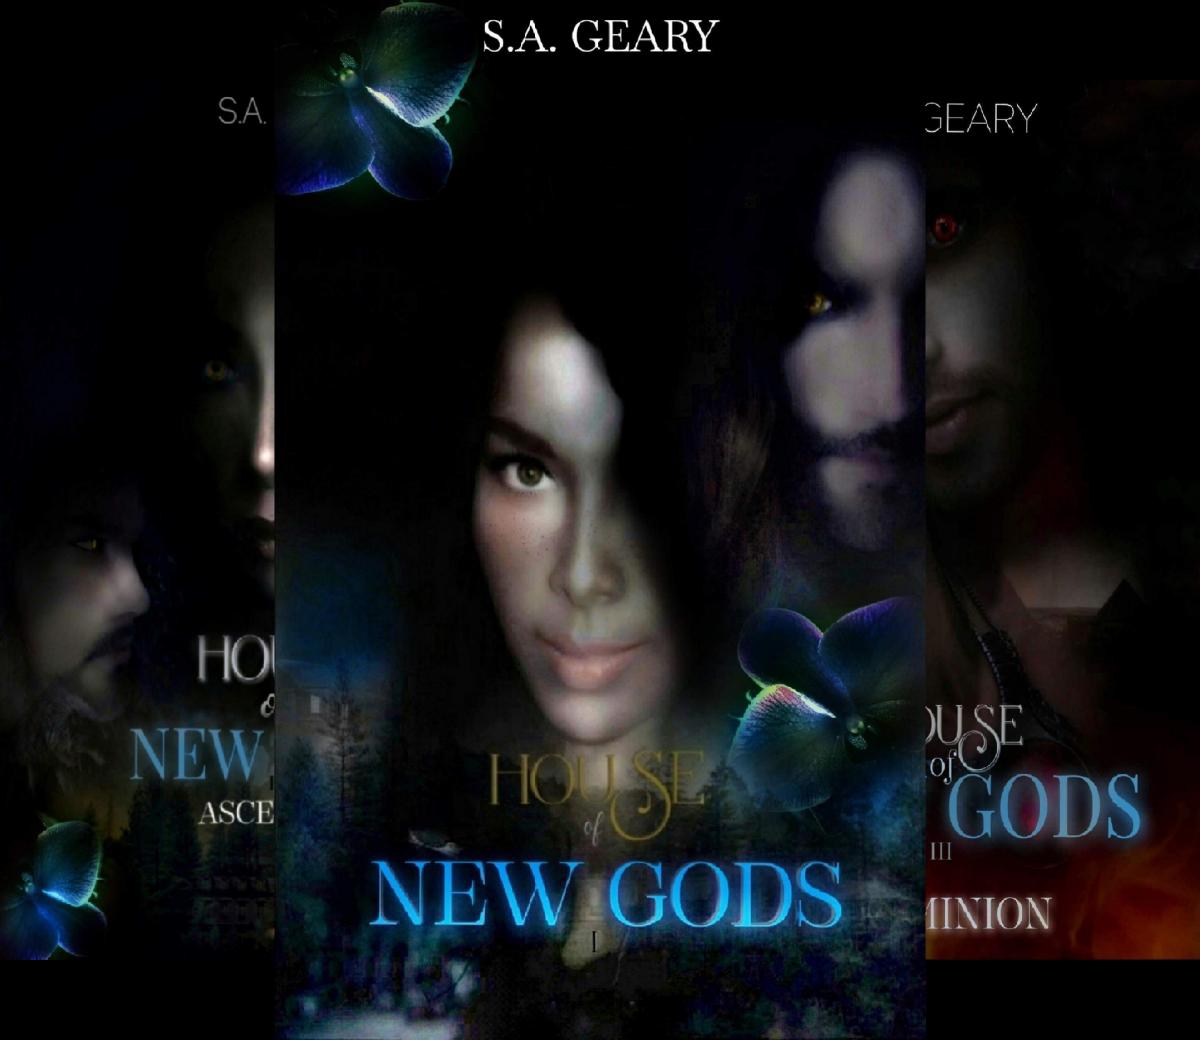 Free: House of New Gods